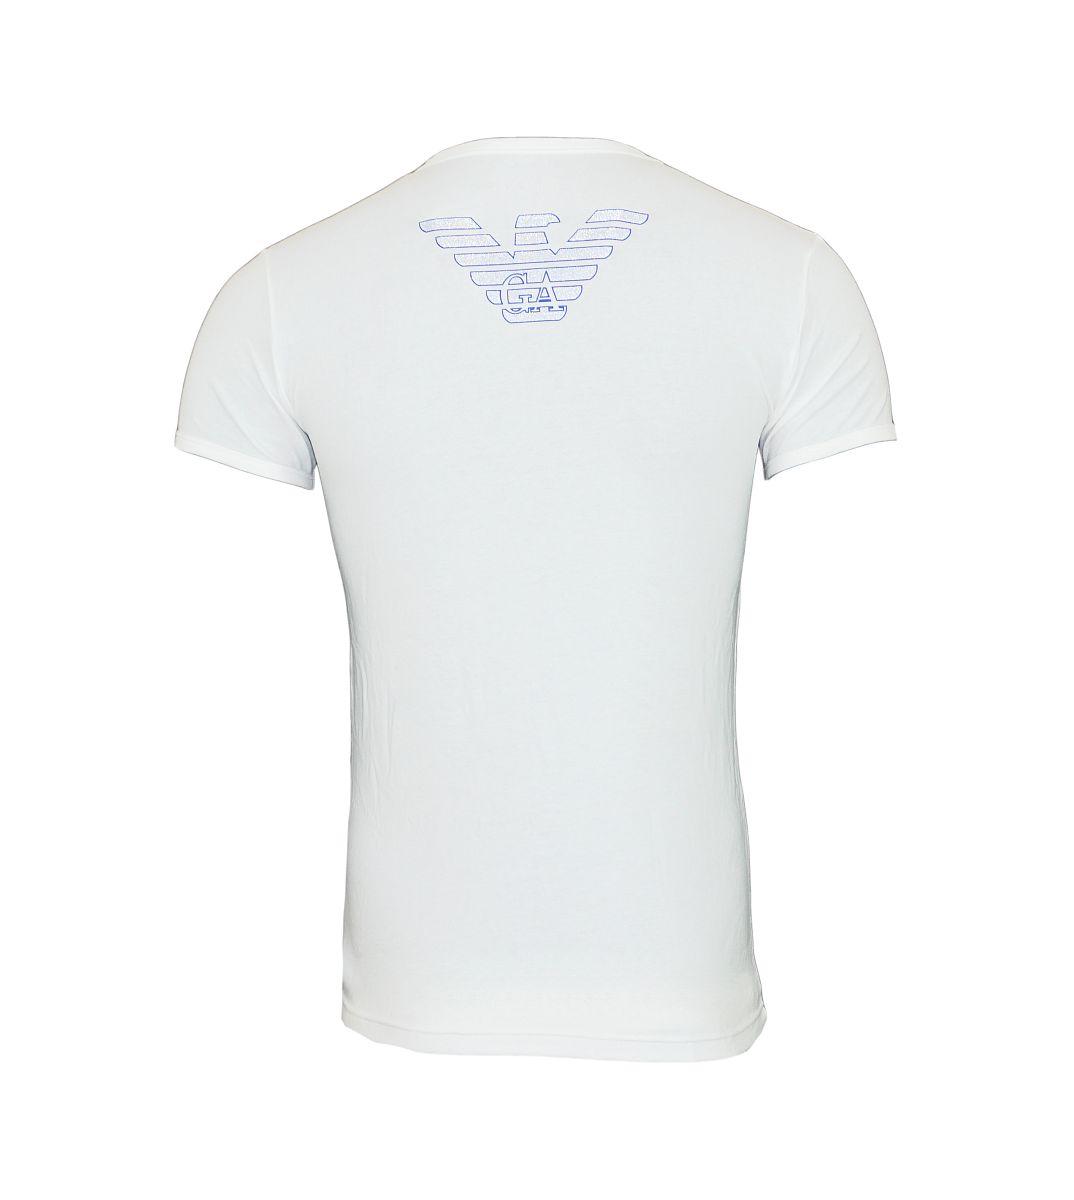 Emporio Armani T-Shirt Shirt Rundhals 111035 6A725 00010 Bianco HW17-ART